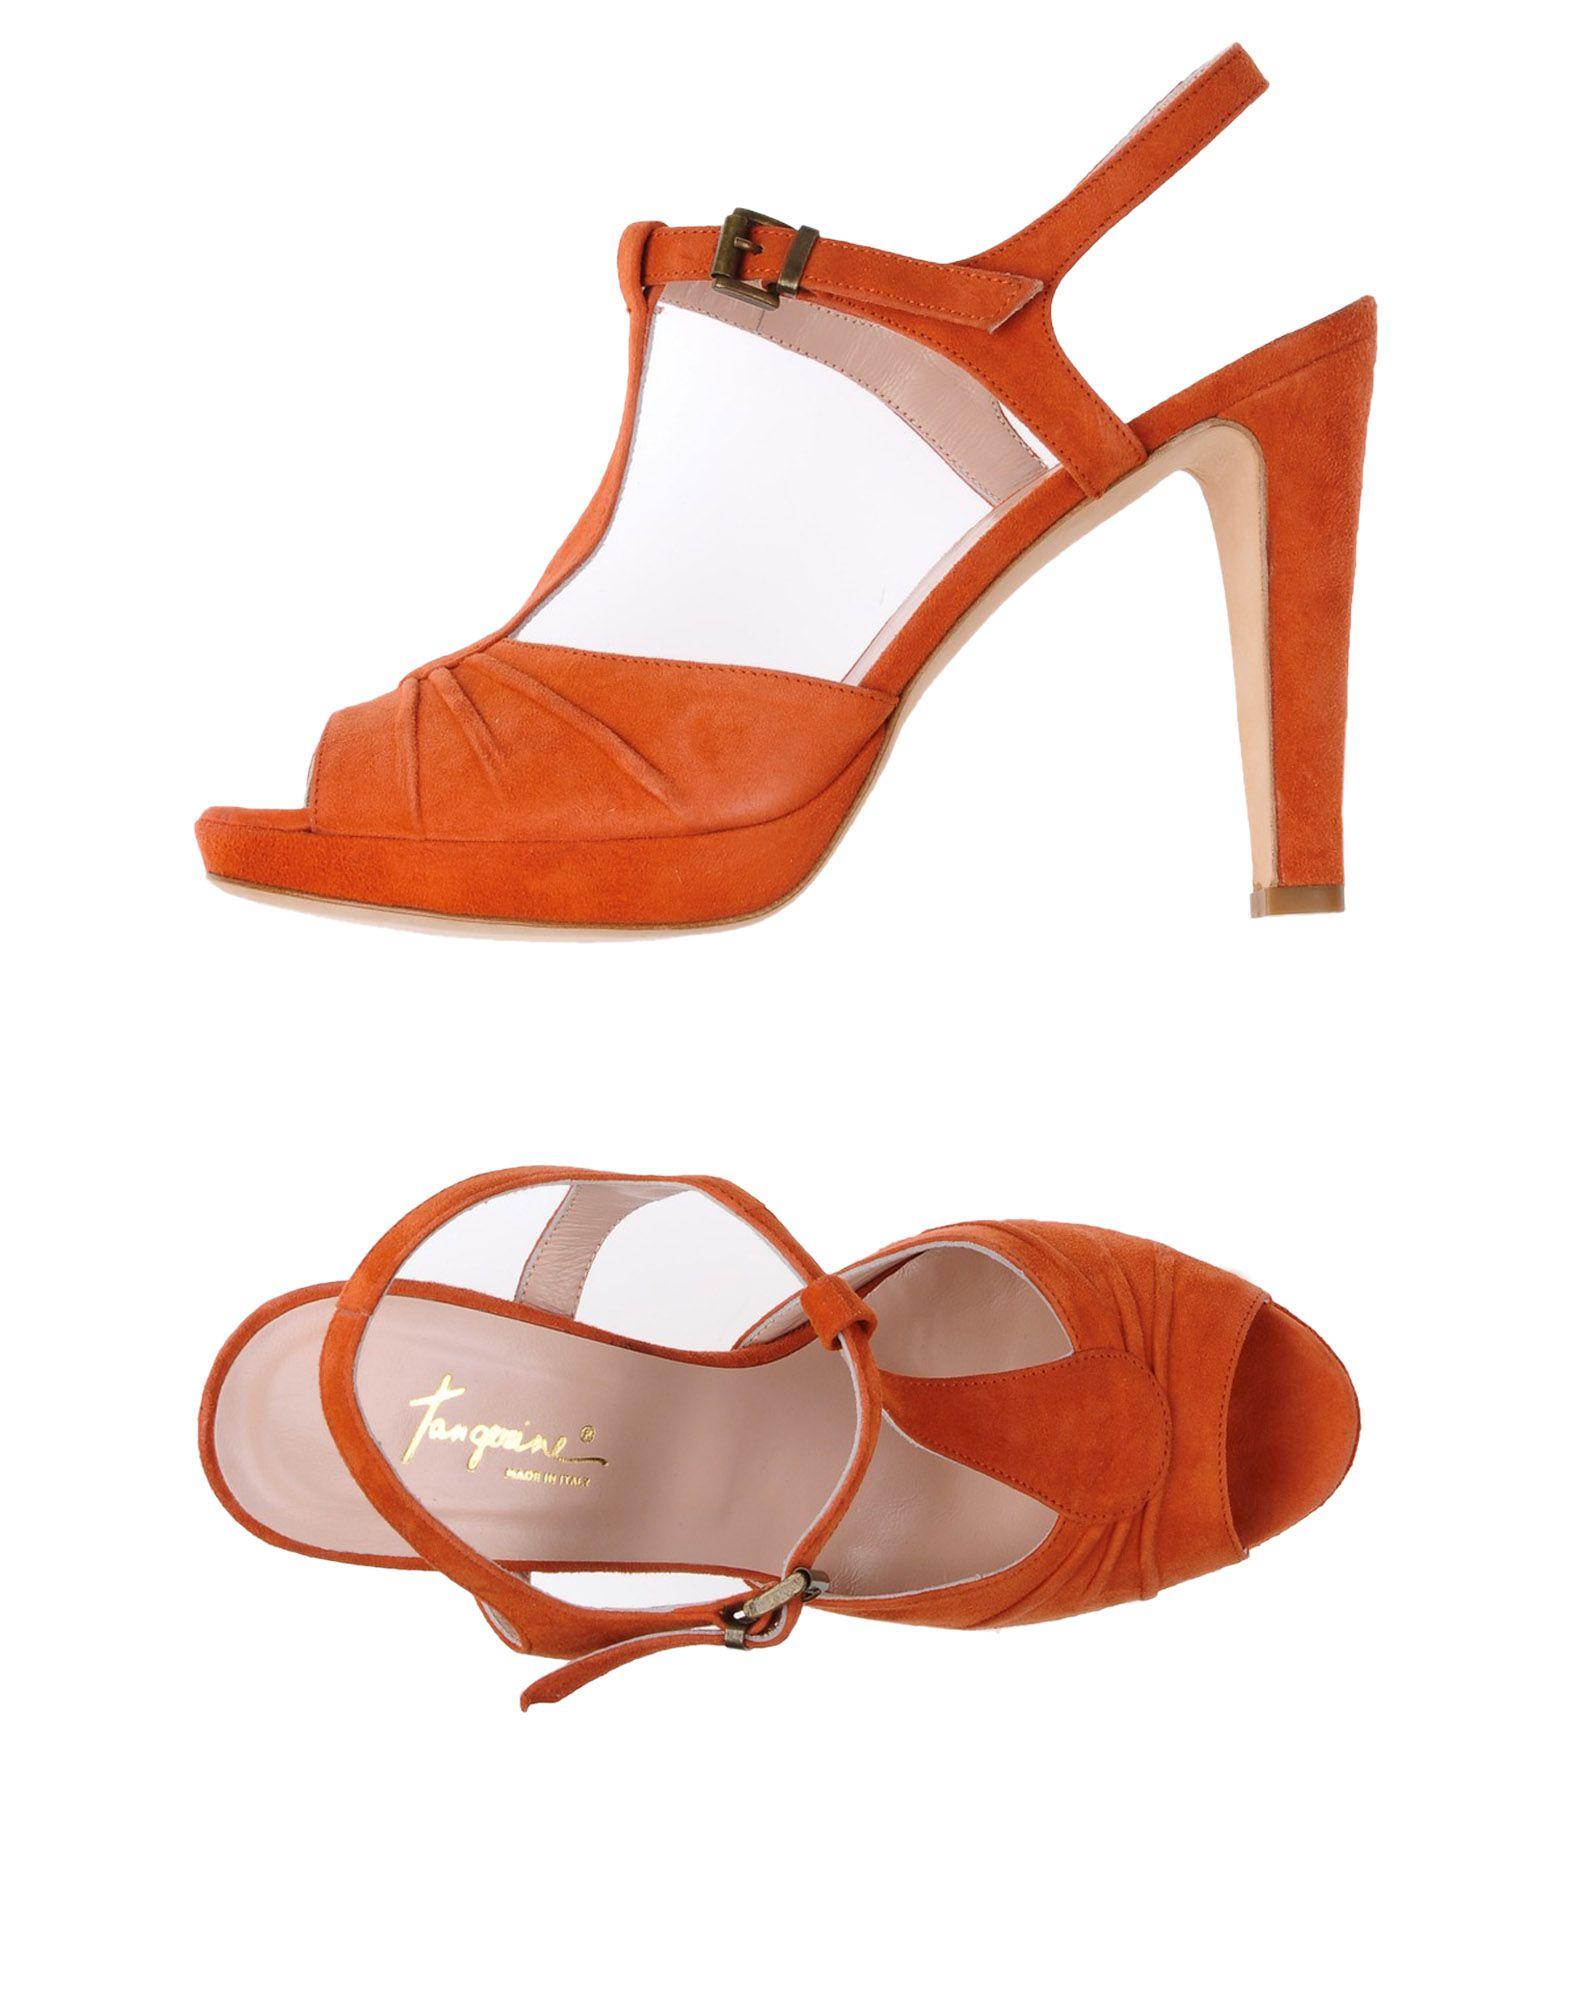 A buon mercato Sandali Tangerine Donna - 11285761AB